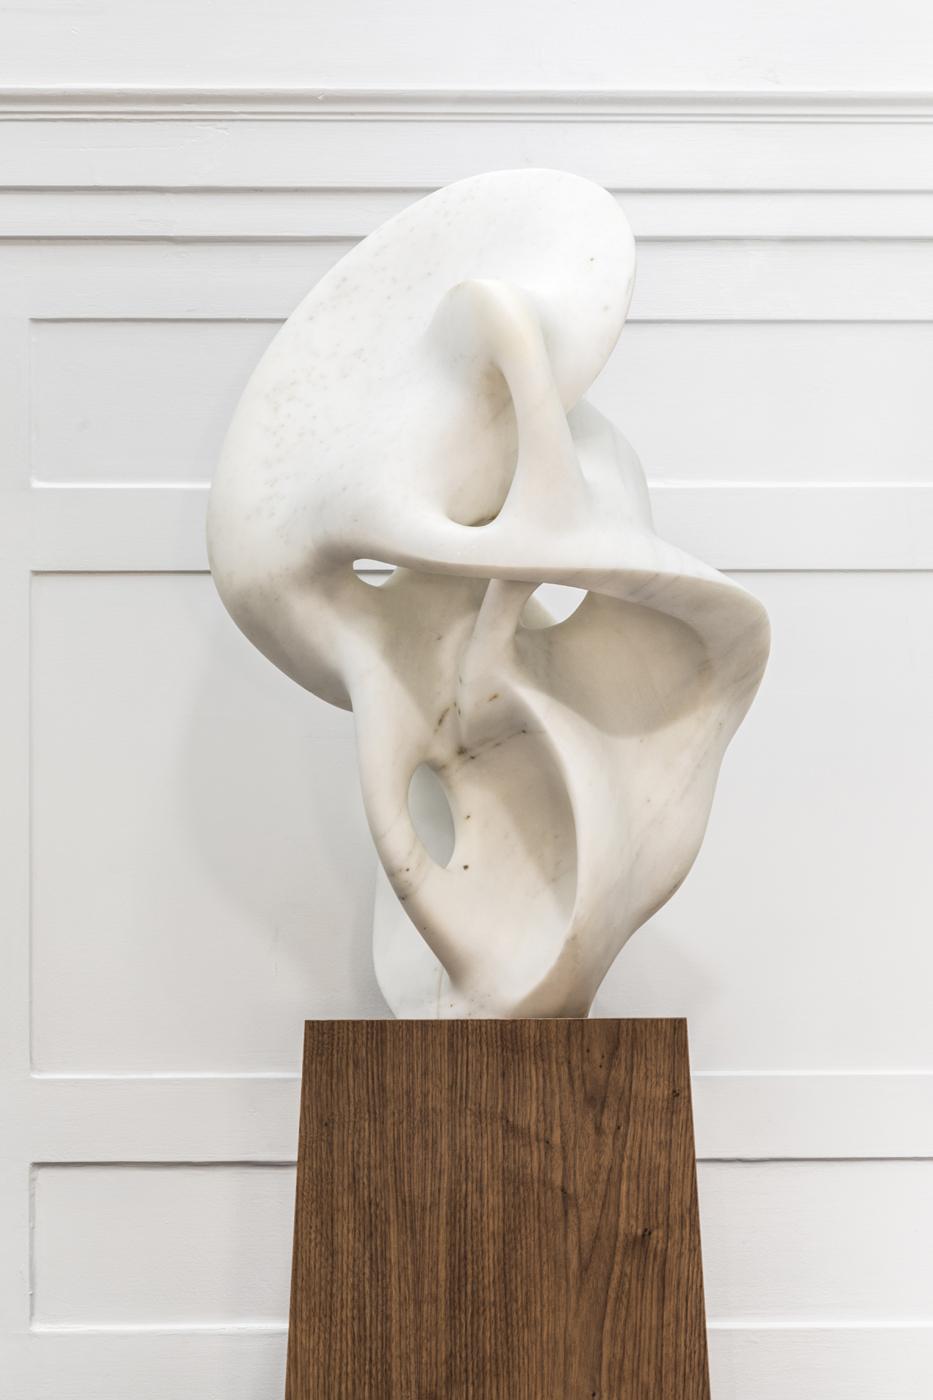 White marble abstract modern Saint Clair Cemin sculpture on tapered wooden pedestal | Savage Interior Design